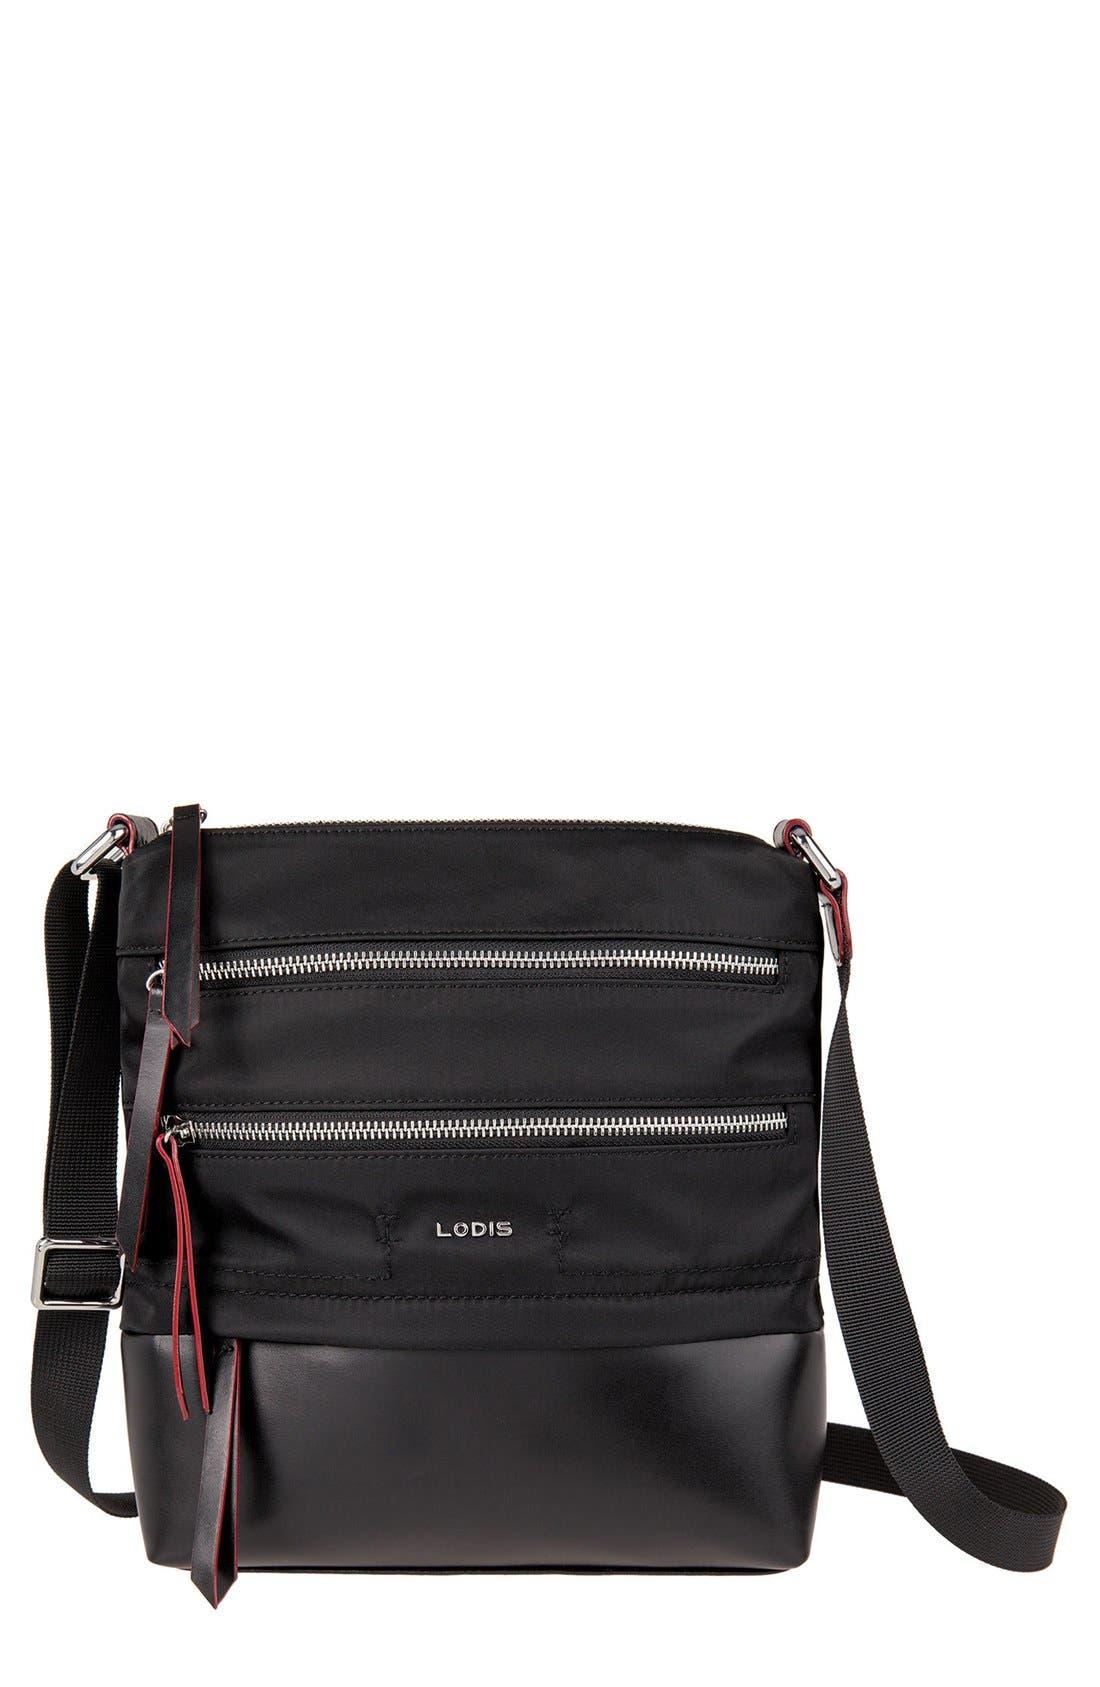 Wanda RFID Nylon & Leather Crossbody Bag,                         Main,                         color, Black